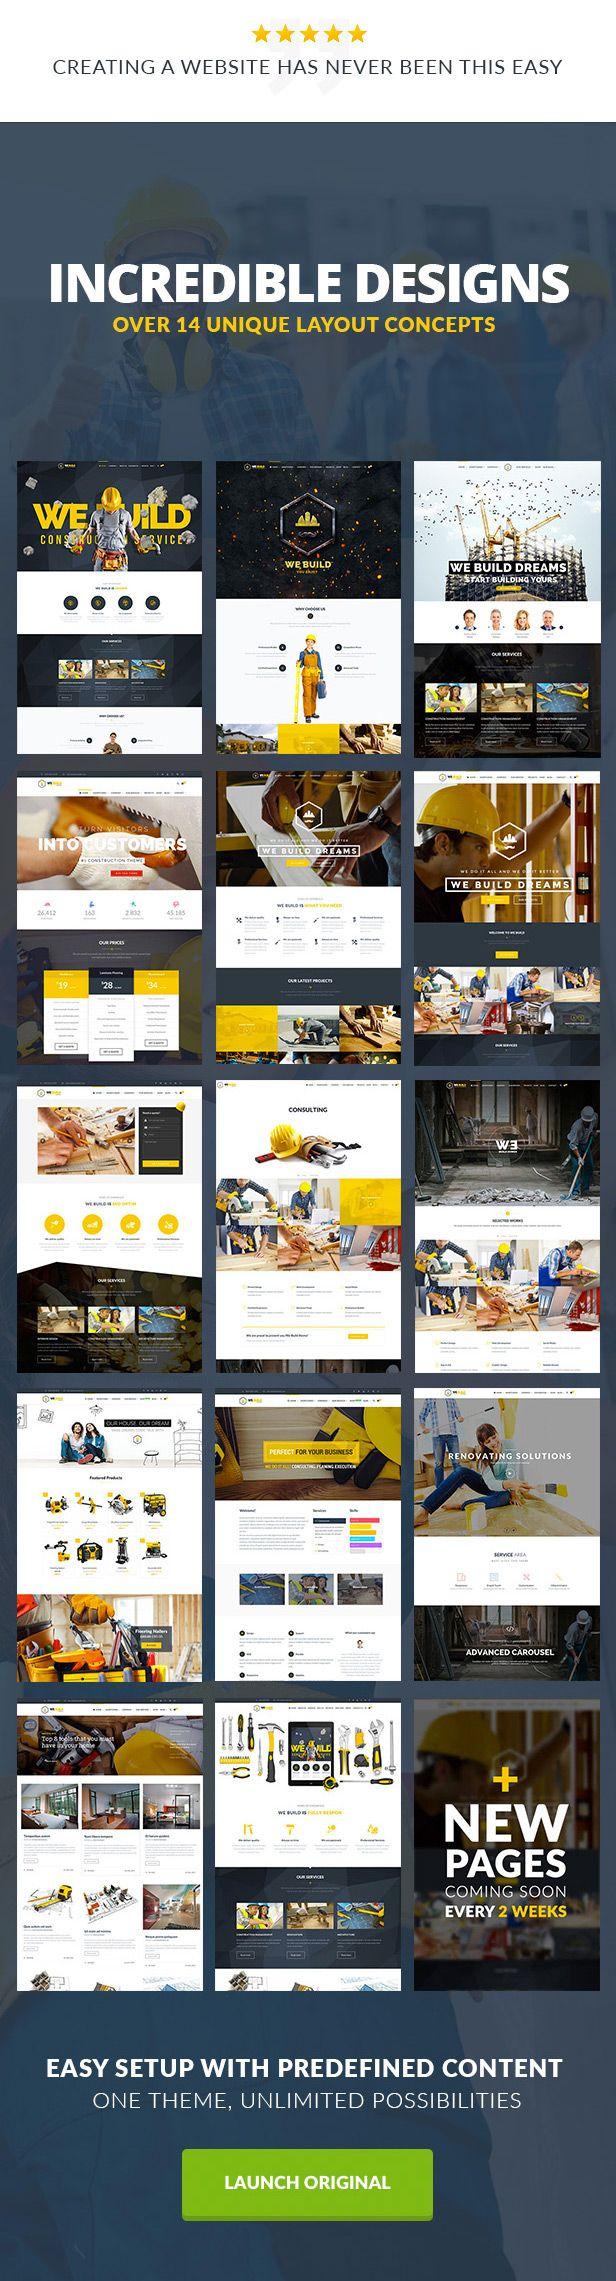 We Build - Construction, Building Shopify Theme on Behance